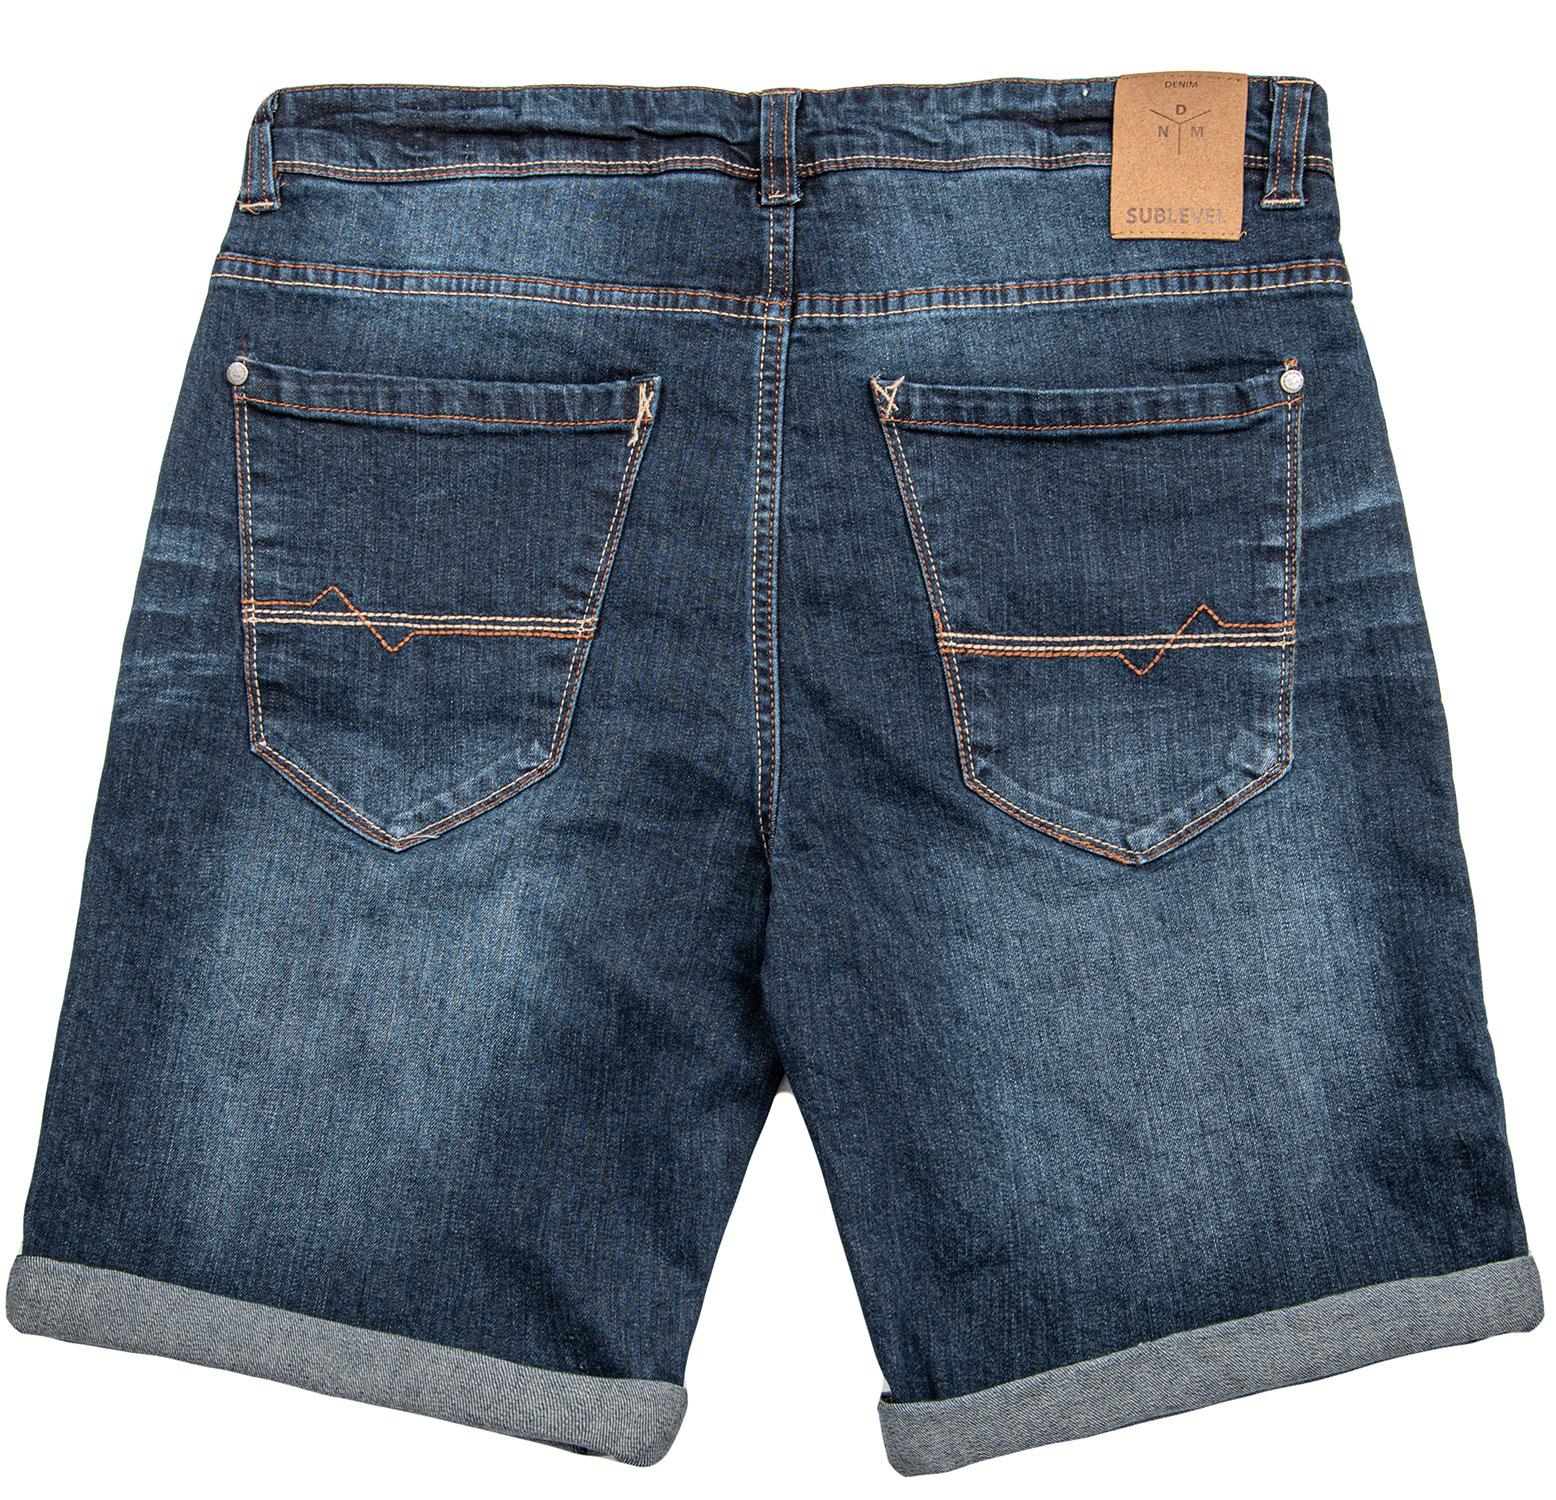 Sublevel-Herren-Sweat-Jeans-Shorts-kurze-Hose-Bermuda-Sommer-Sweathose-Slim-NEU Indexbild 56